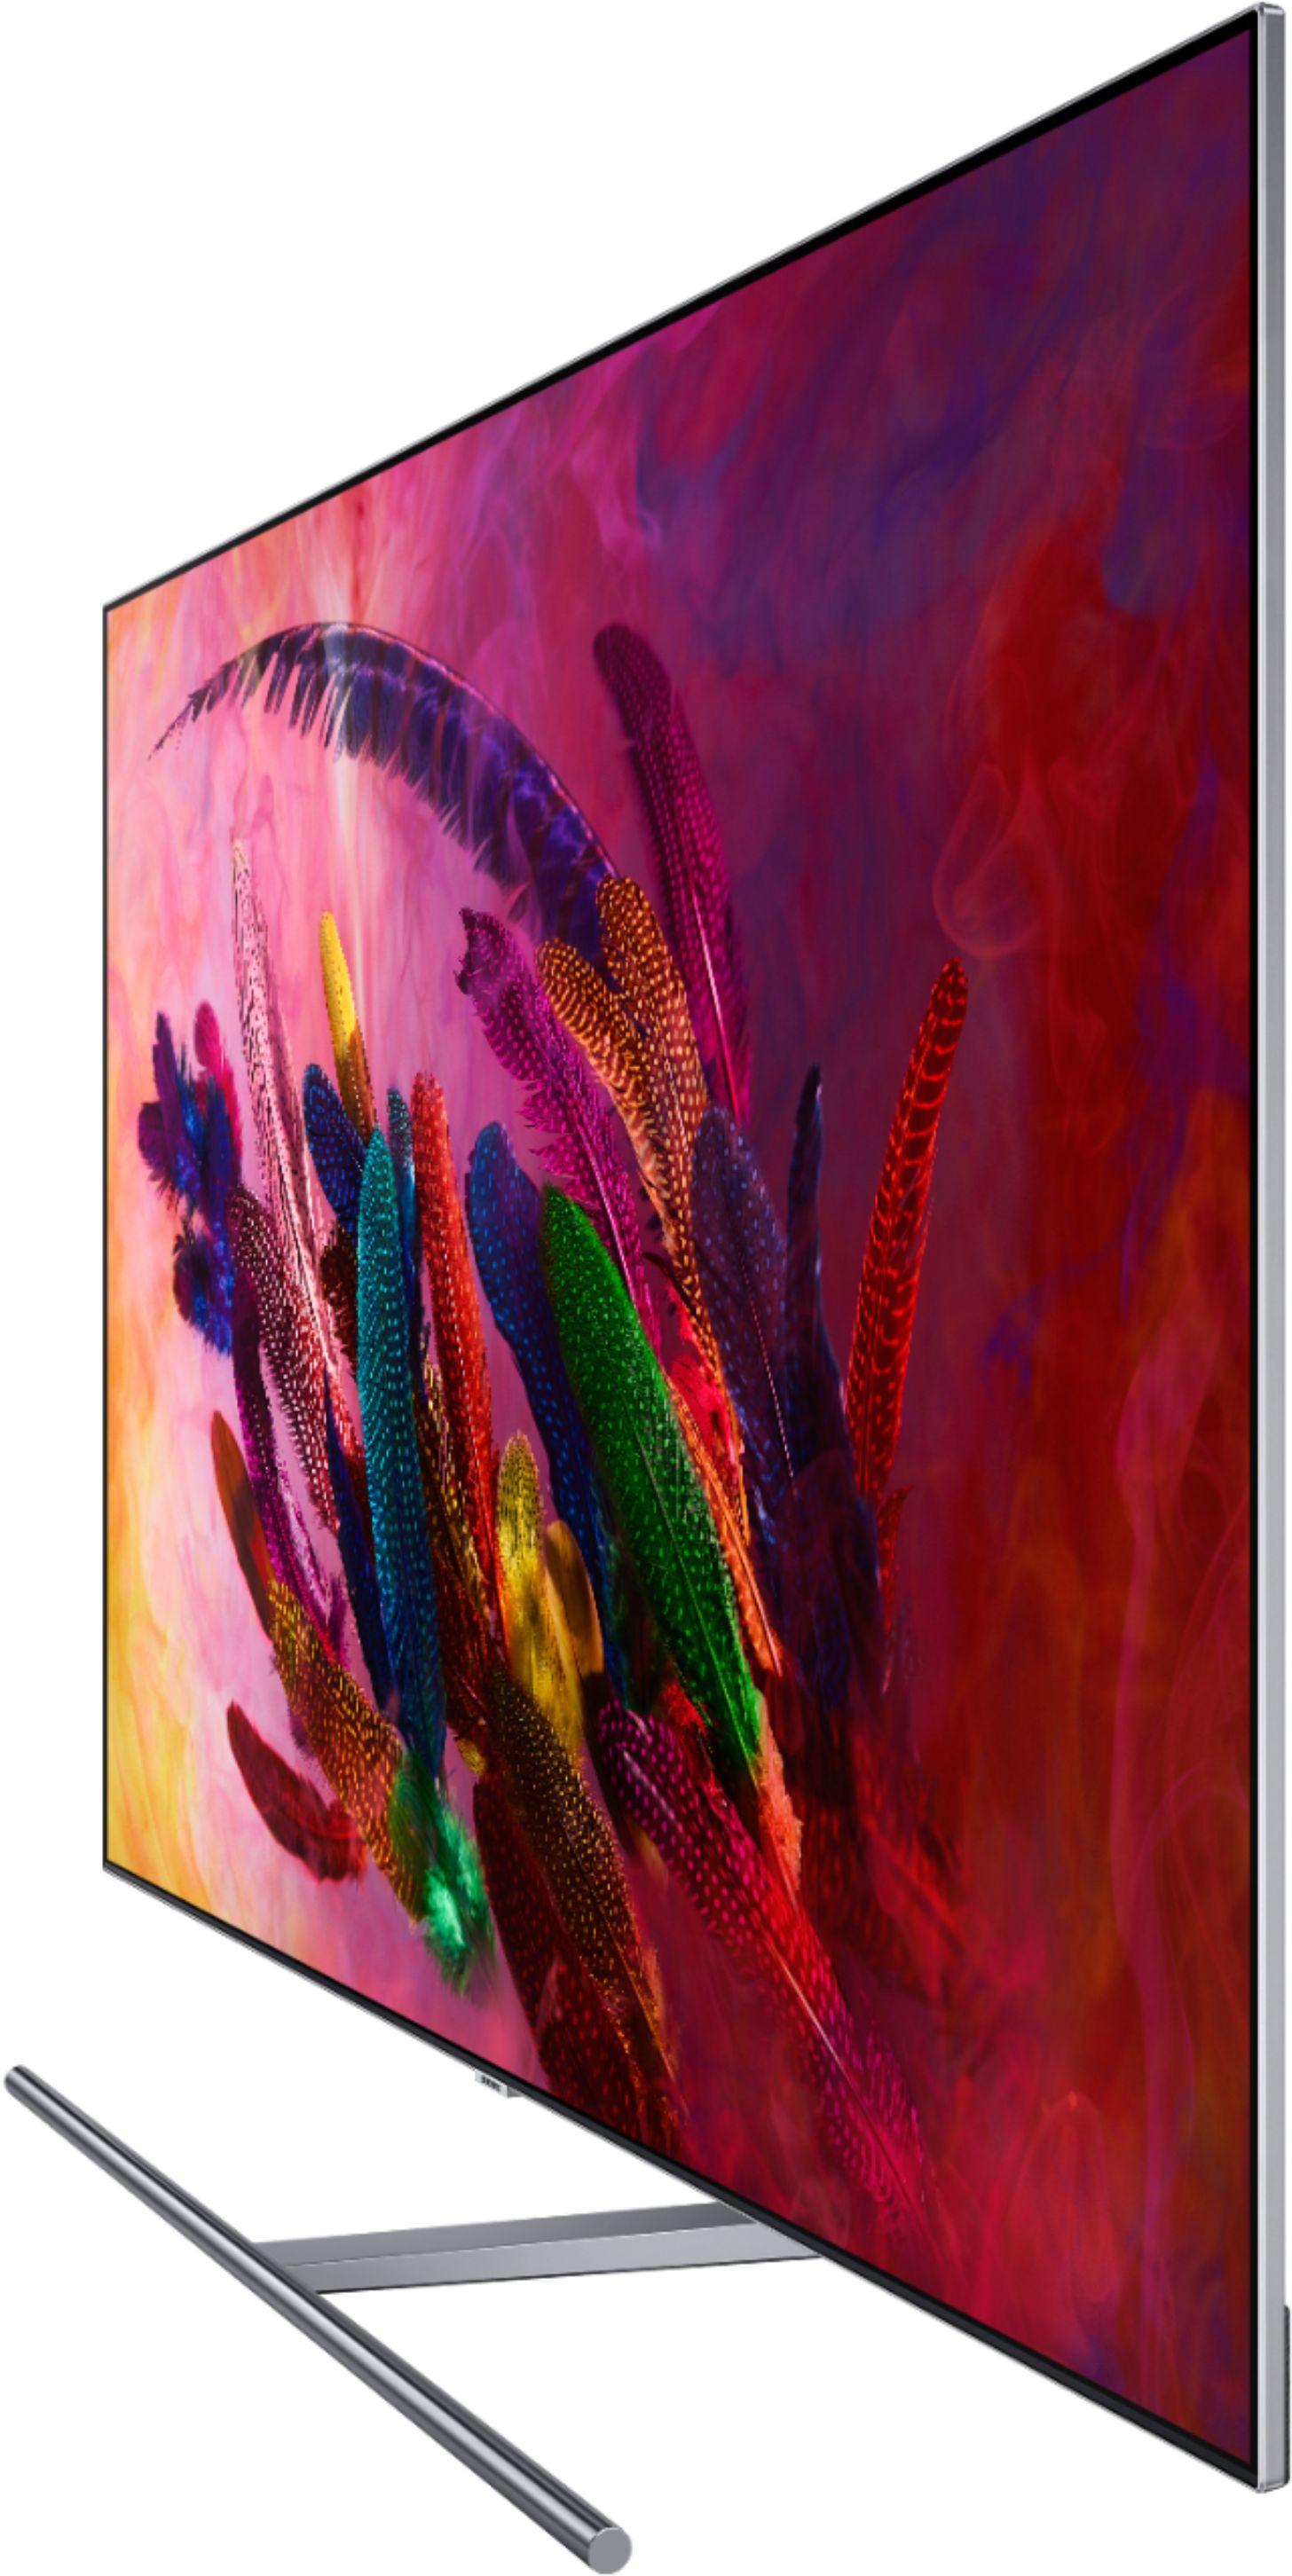 Image 12 for Samsung QN65Q7FNAFXZA